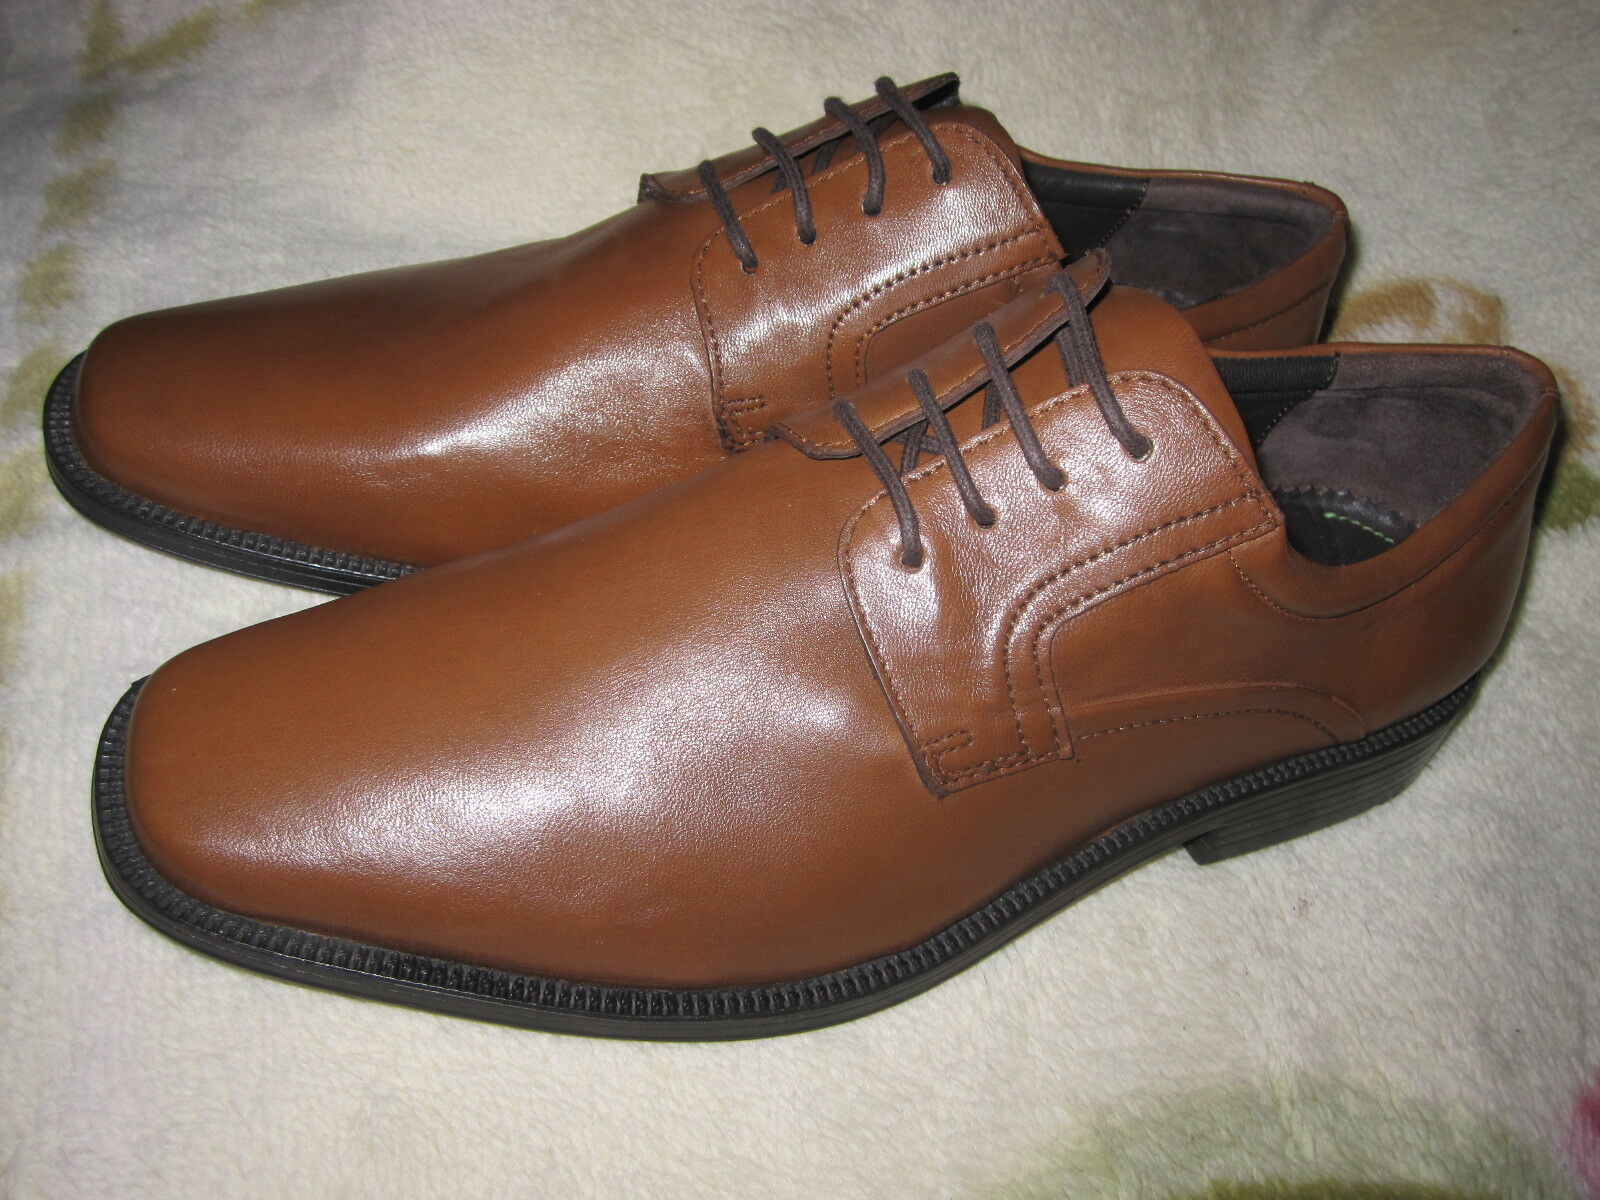 SALAMANDER Herren Schuhe Gr. 43 Braun Leder